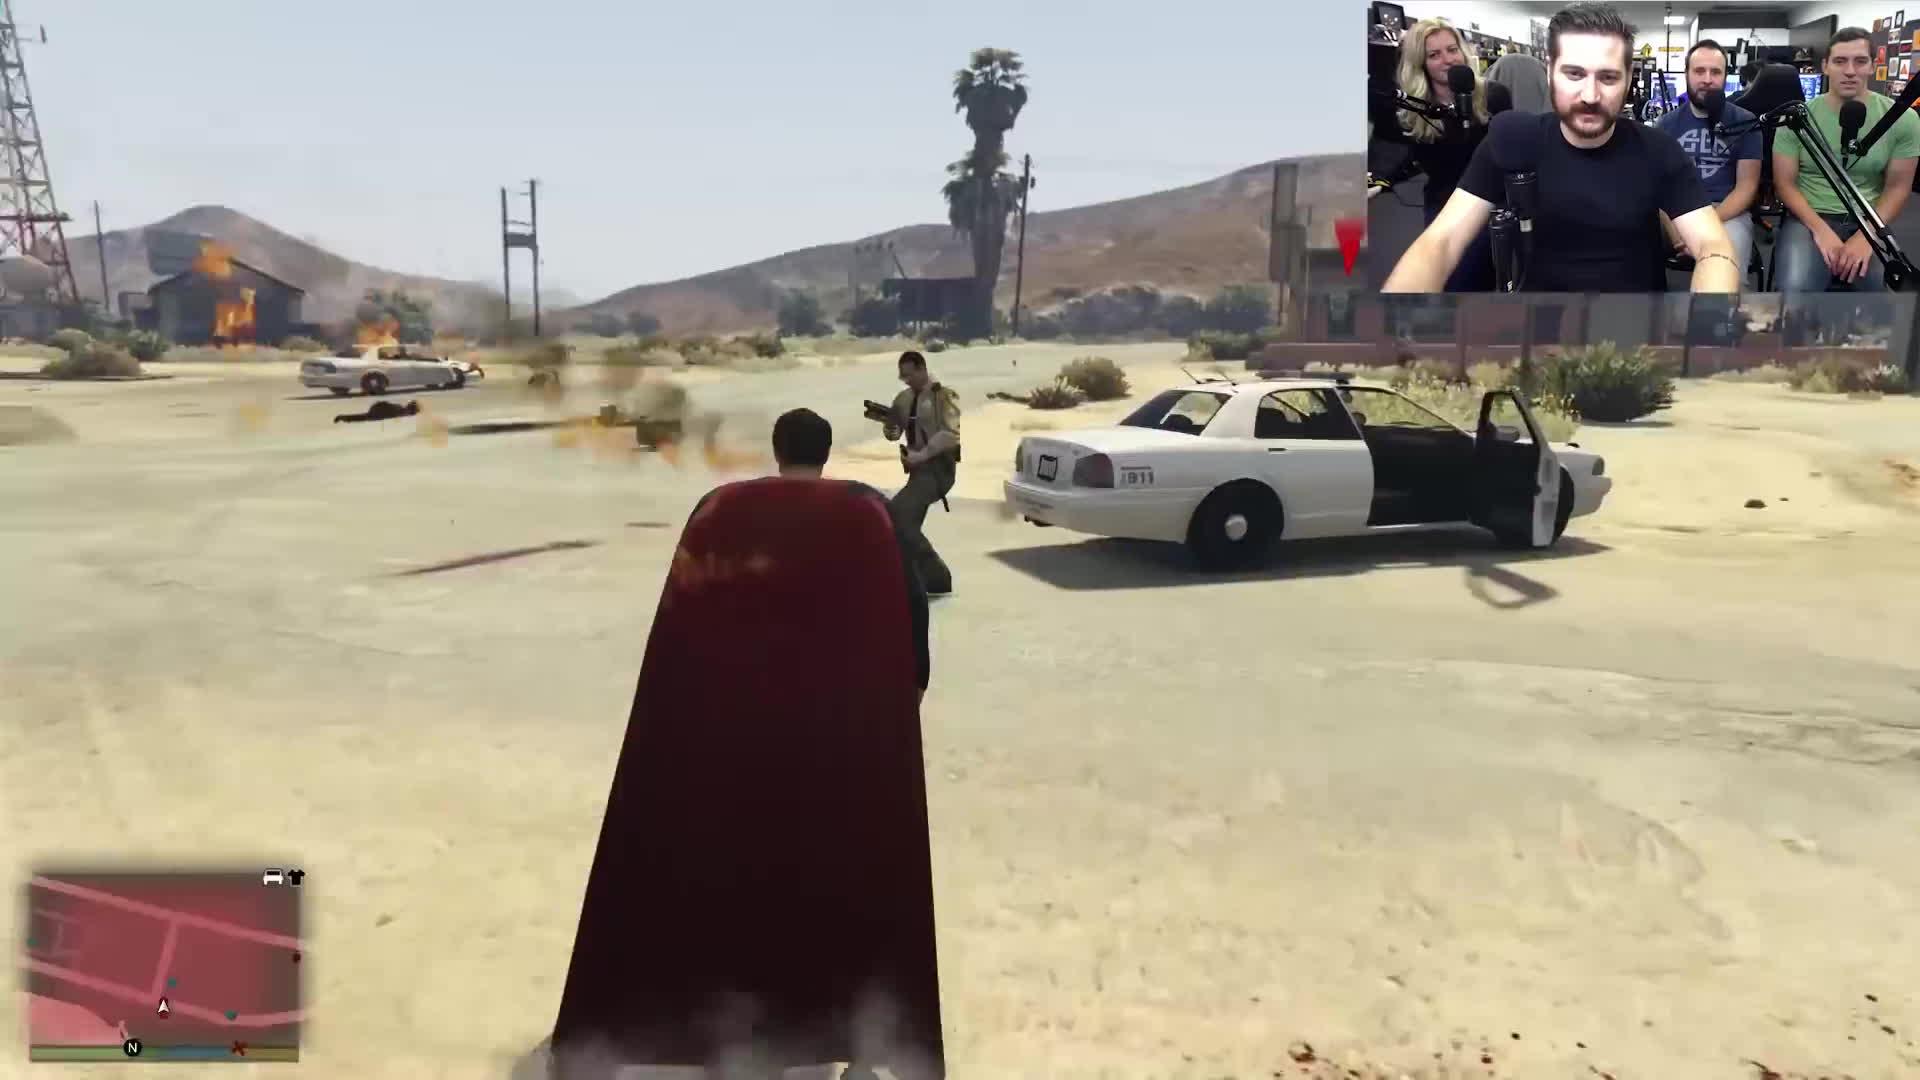 gta 5, superman, vs, [GTA V] Superman, to the rescue! GIFs